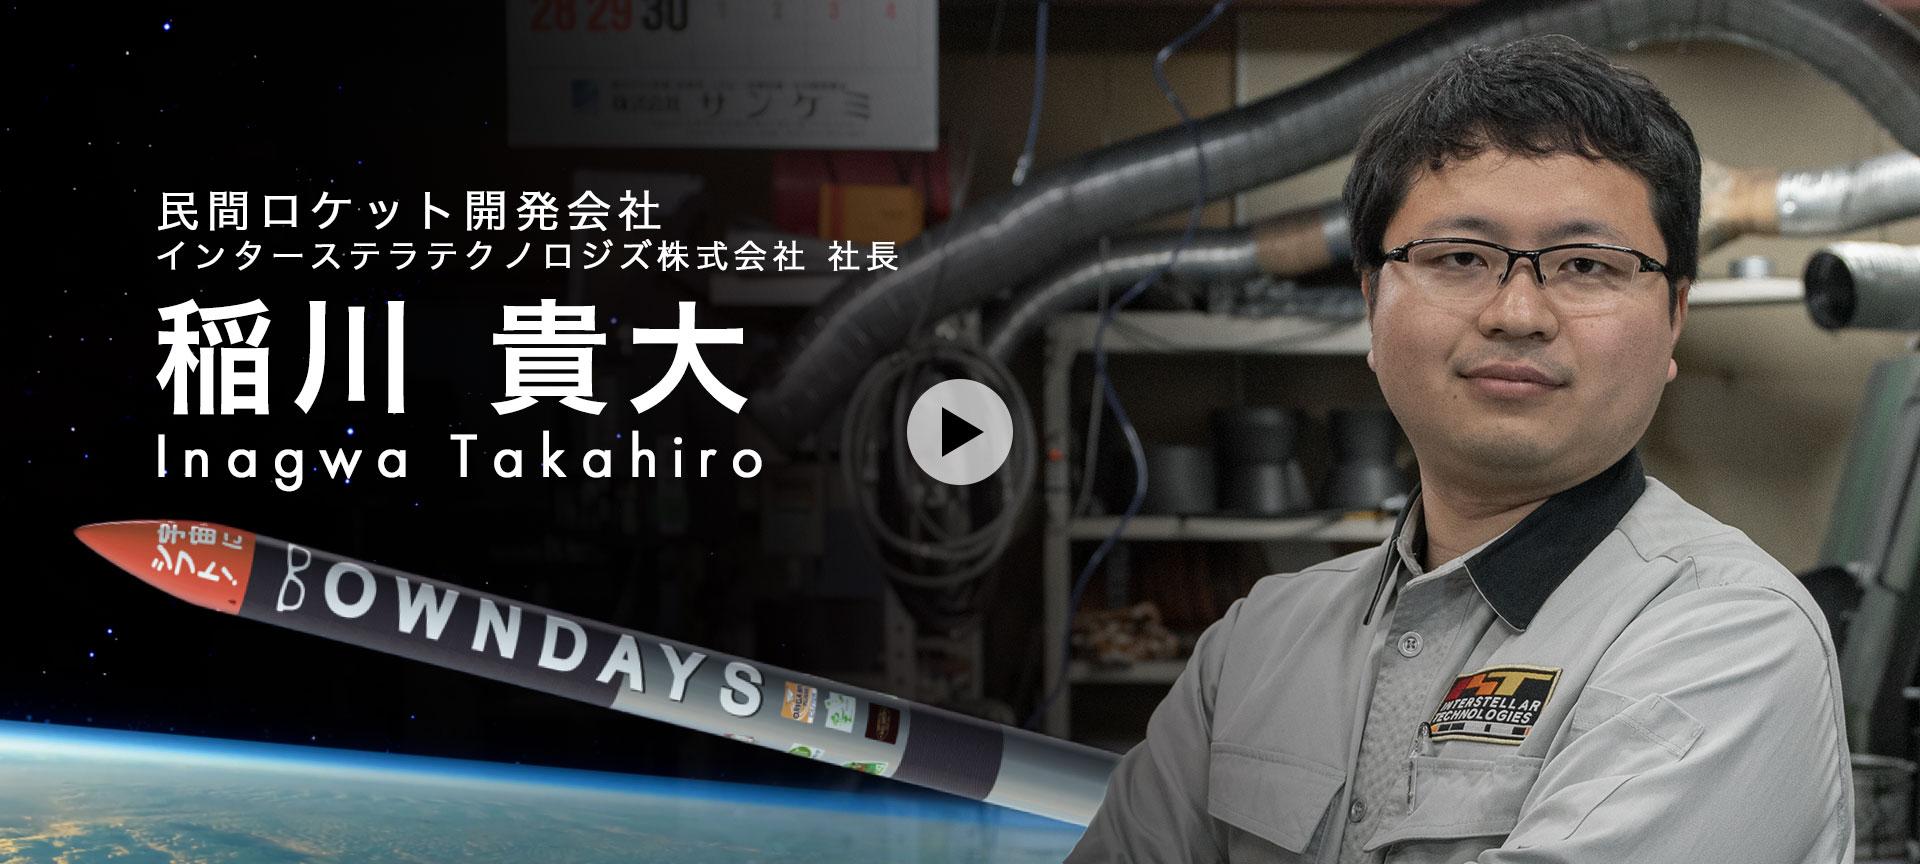 OWNDAYS MEETS 稲川貴大(Takahiro Inagaw)